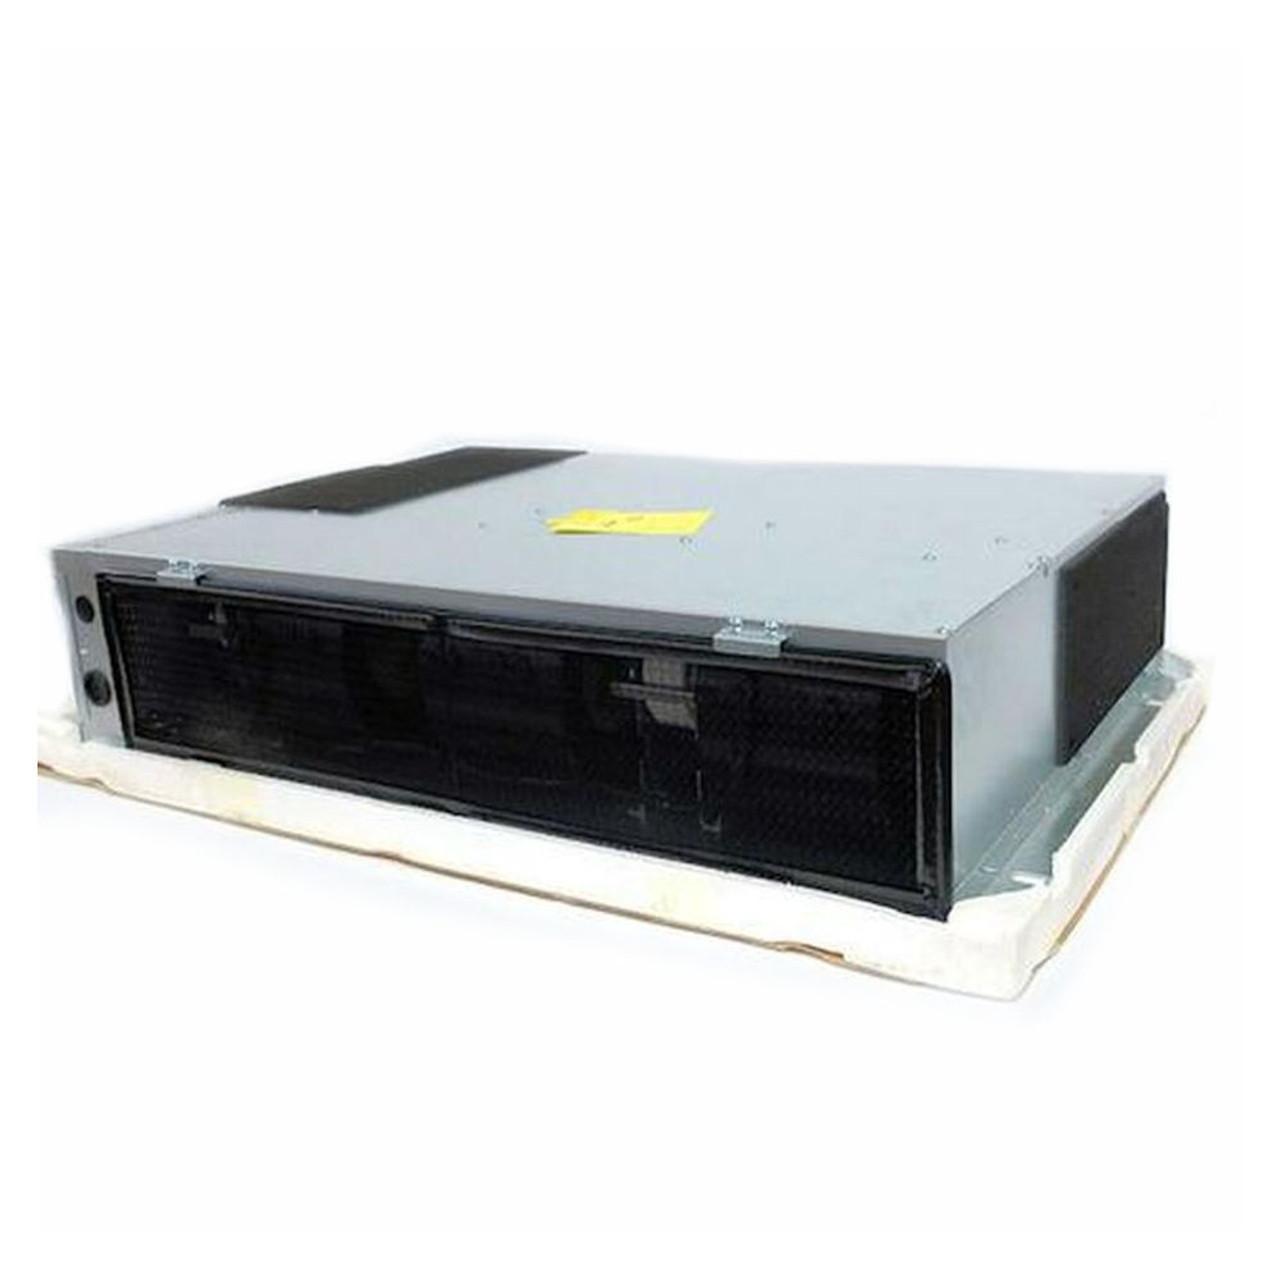 LG 7,500 Btu/h Ceiling Concealed Multi V Ducted Low Static